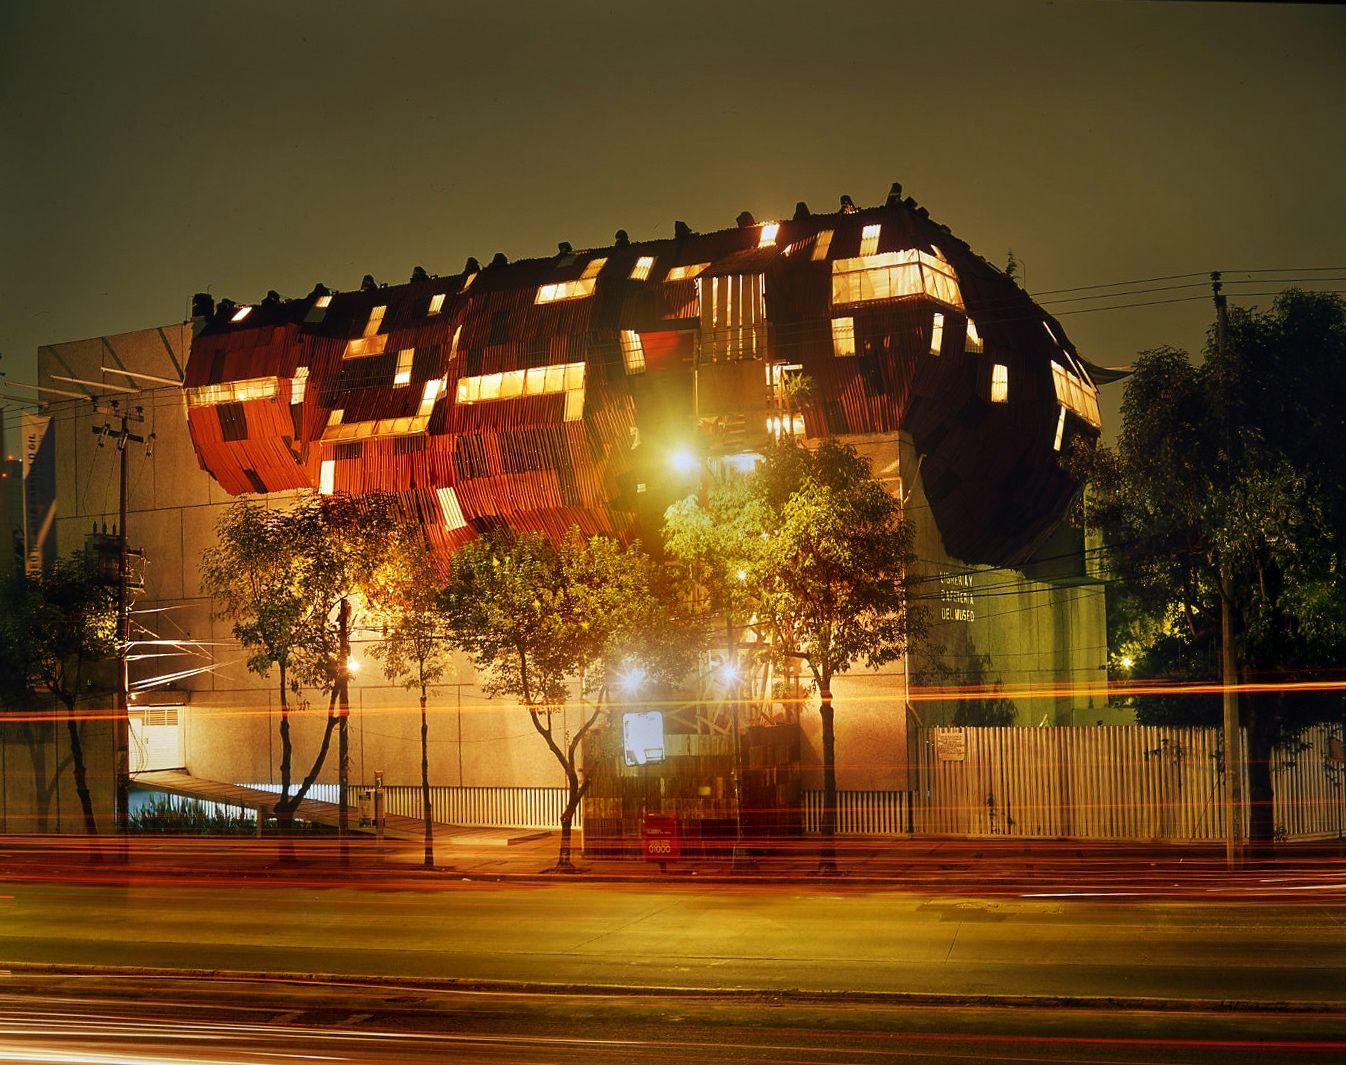 Paracaidista (Squatter) Av. Revolución 1608 bis   Intervención arquitectónica en institución pública.   Acero, madera, y asfalto 74 m2   2004